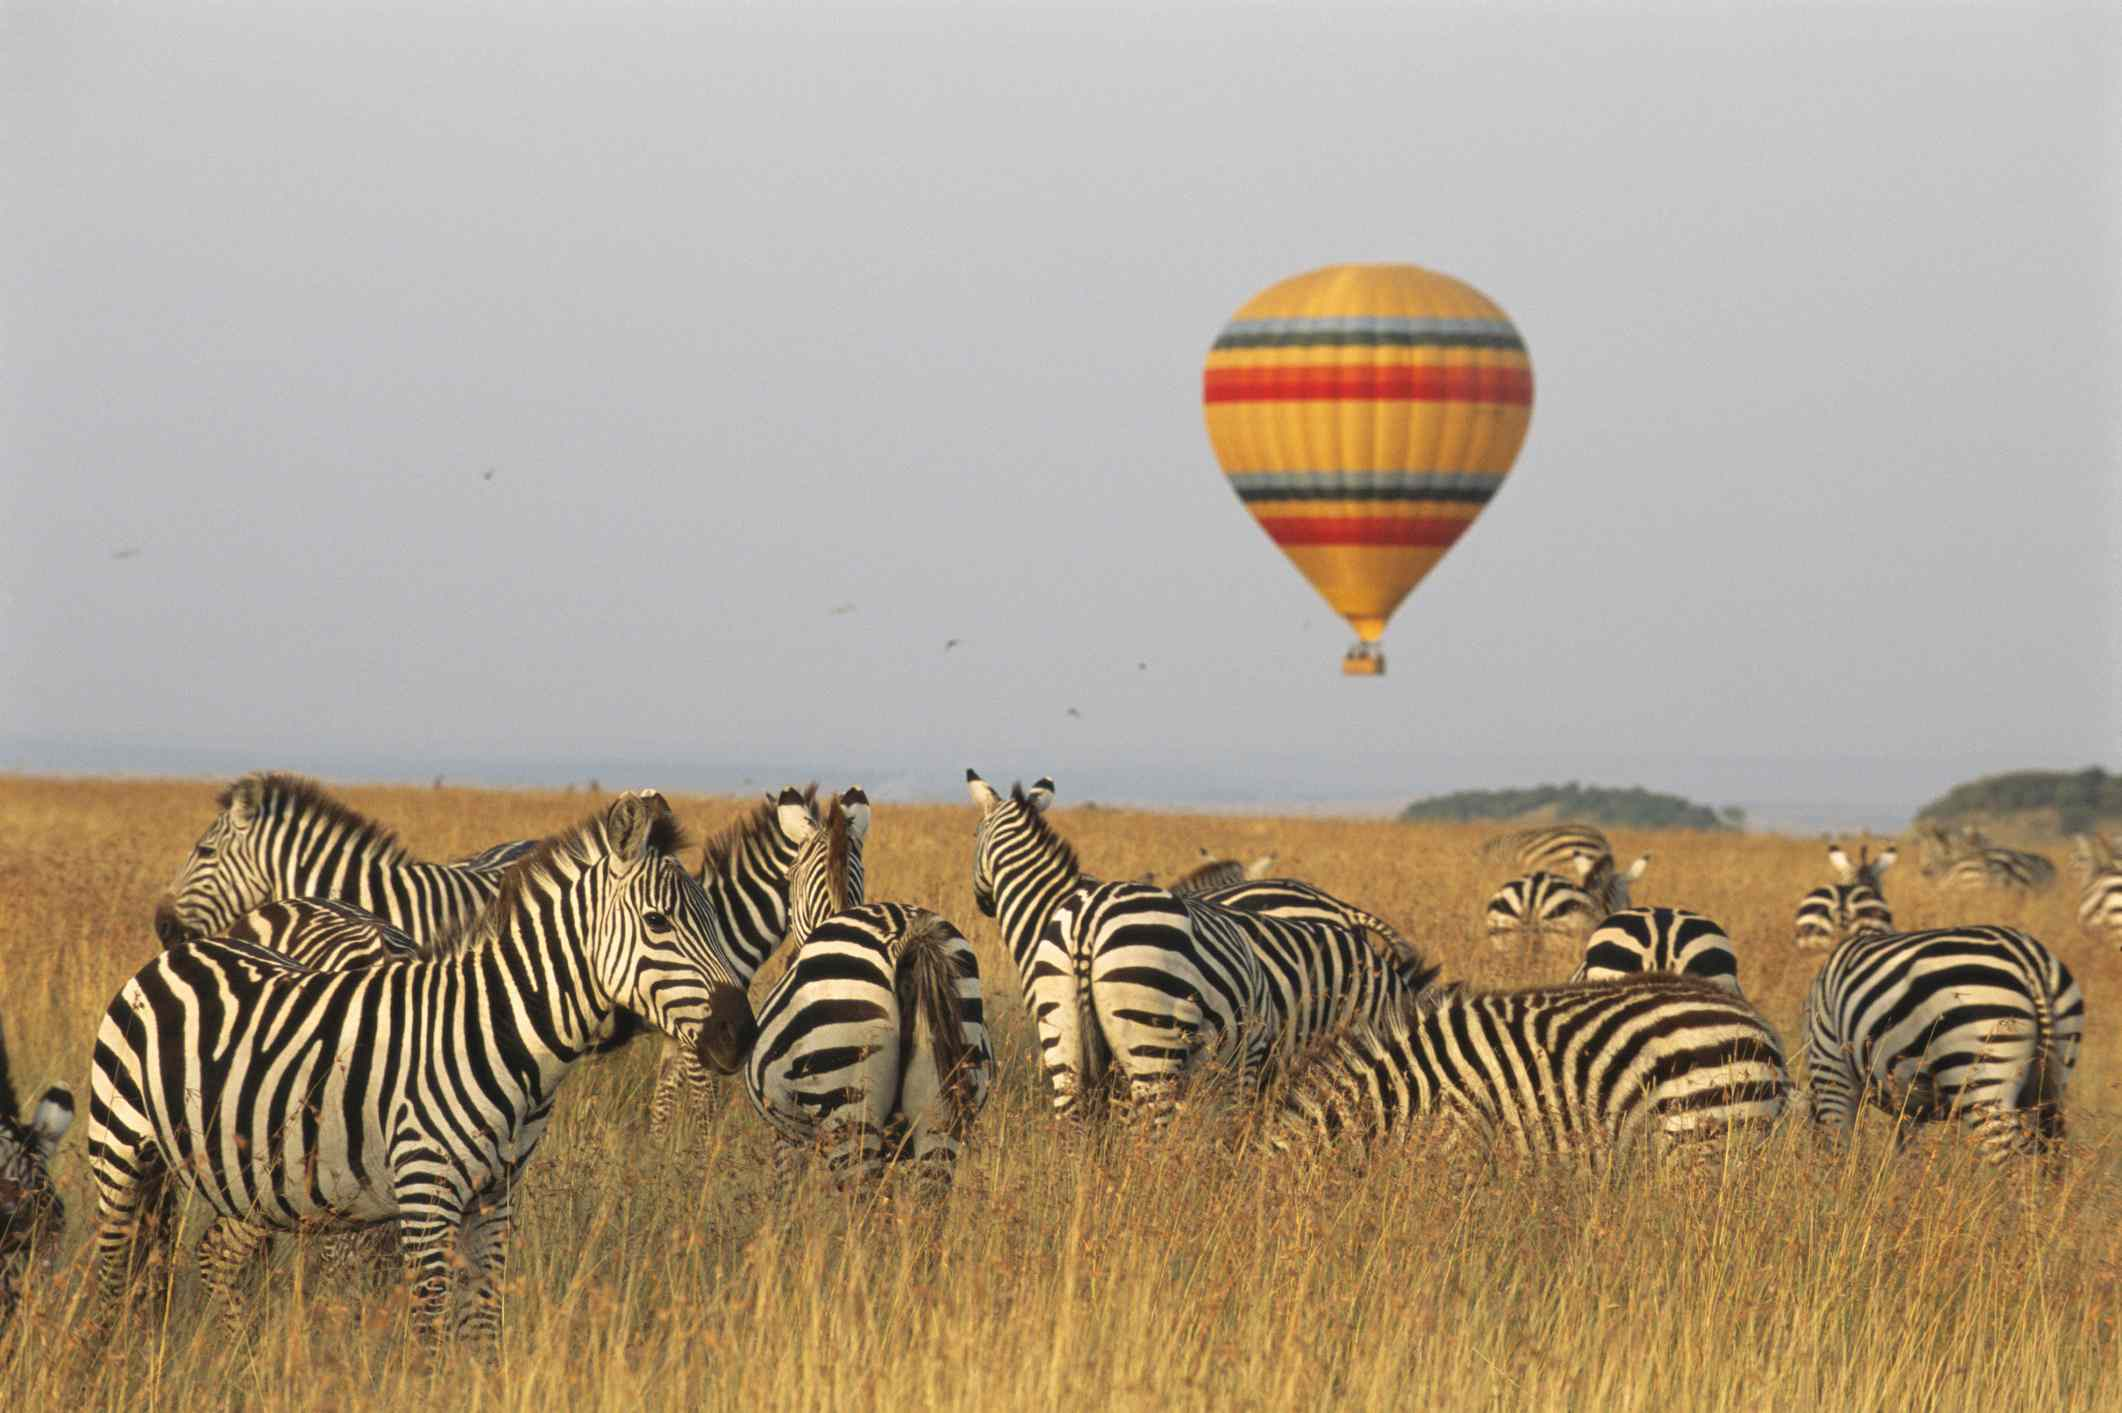 Common zebras and hot air balloon safari